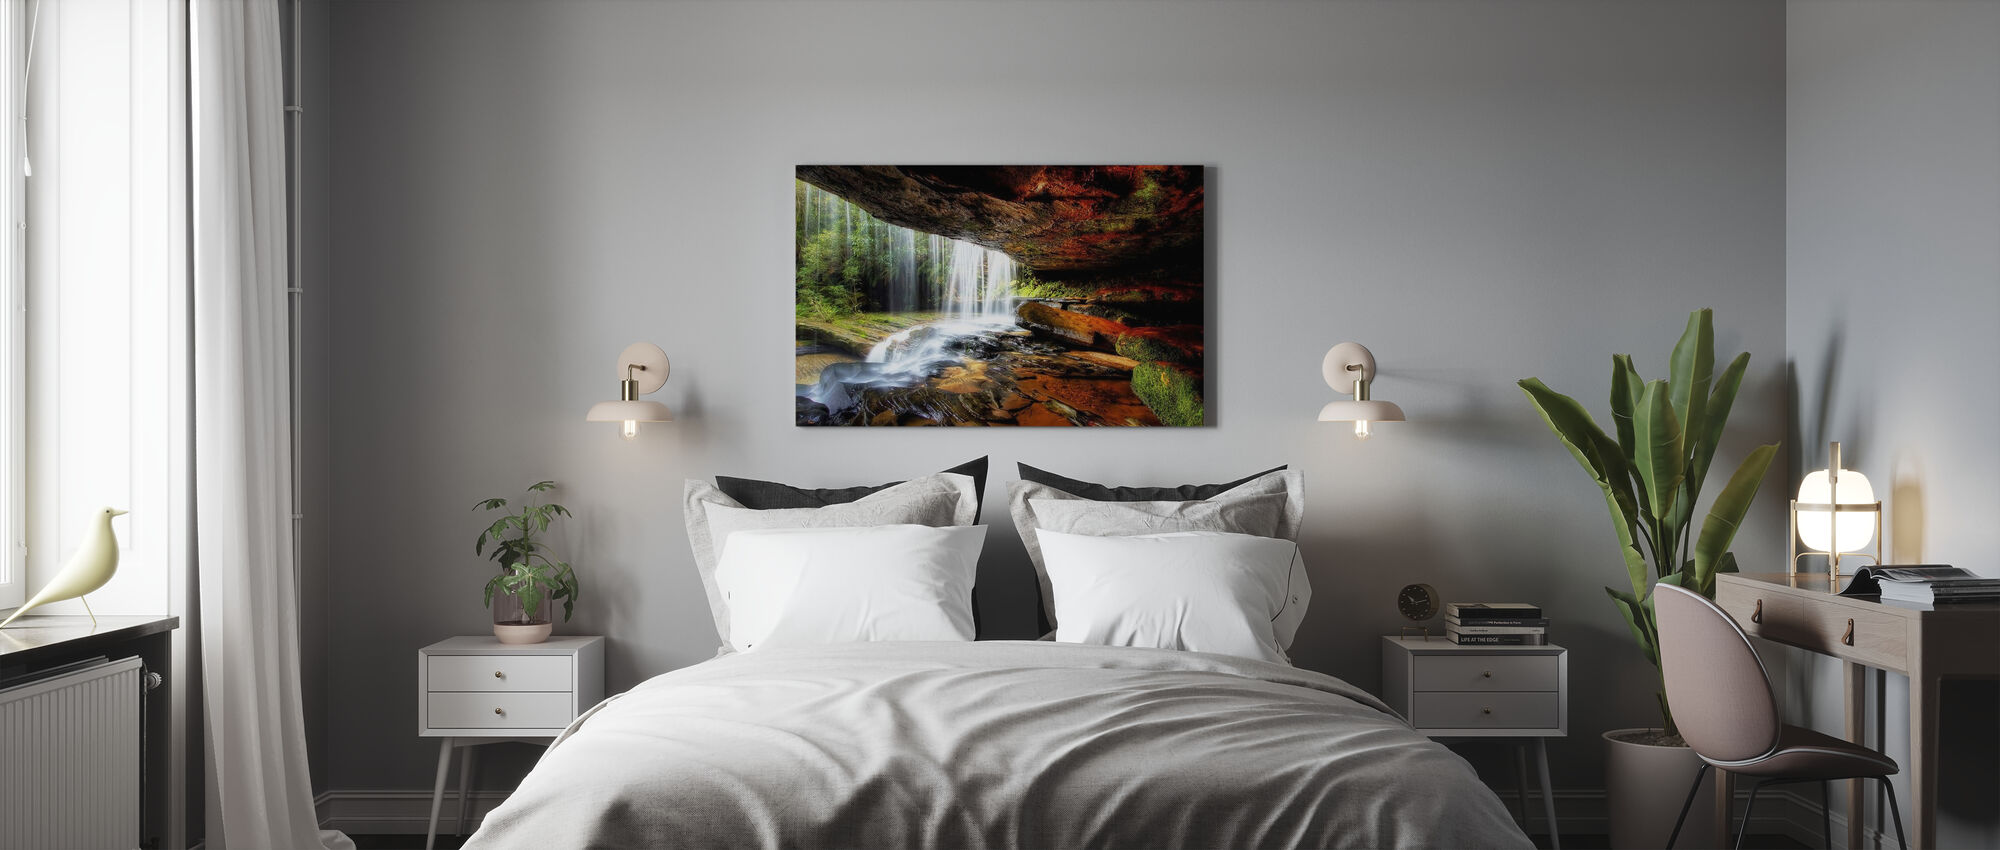 Under the Ledge - Canvas print - Bedroom